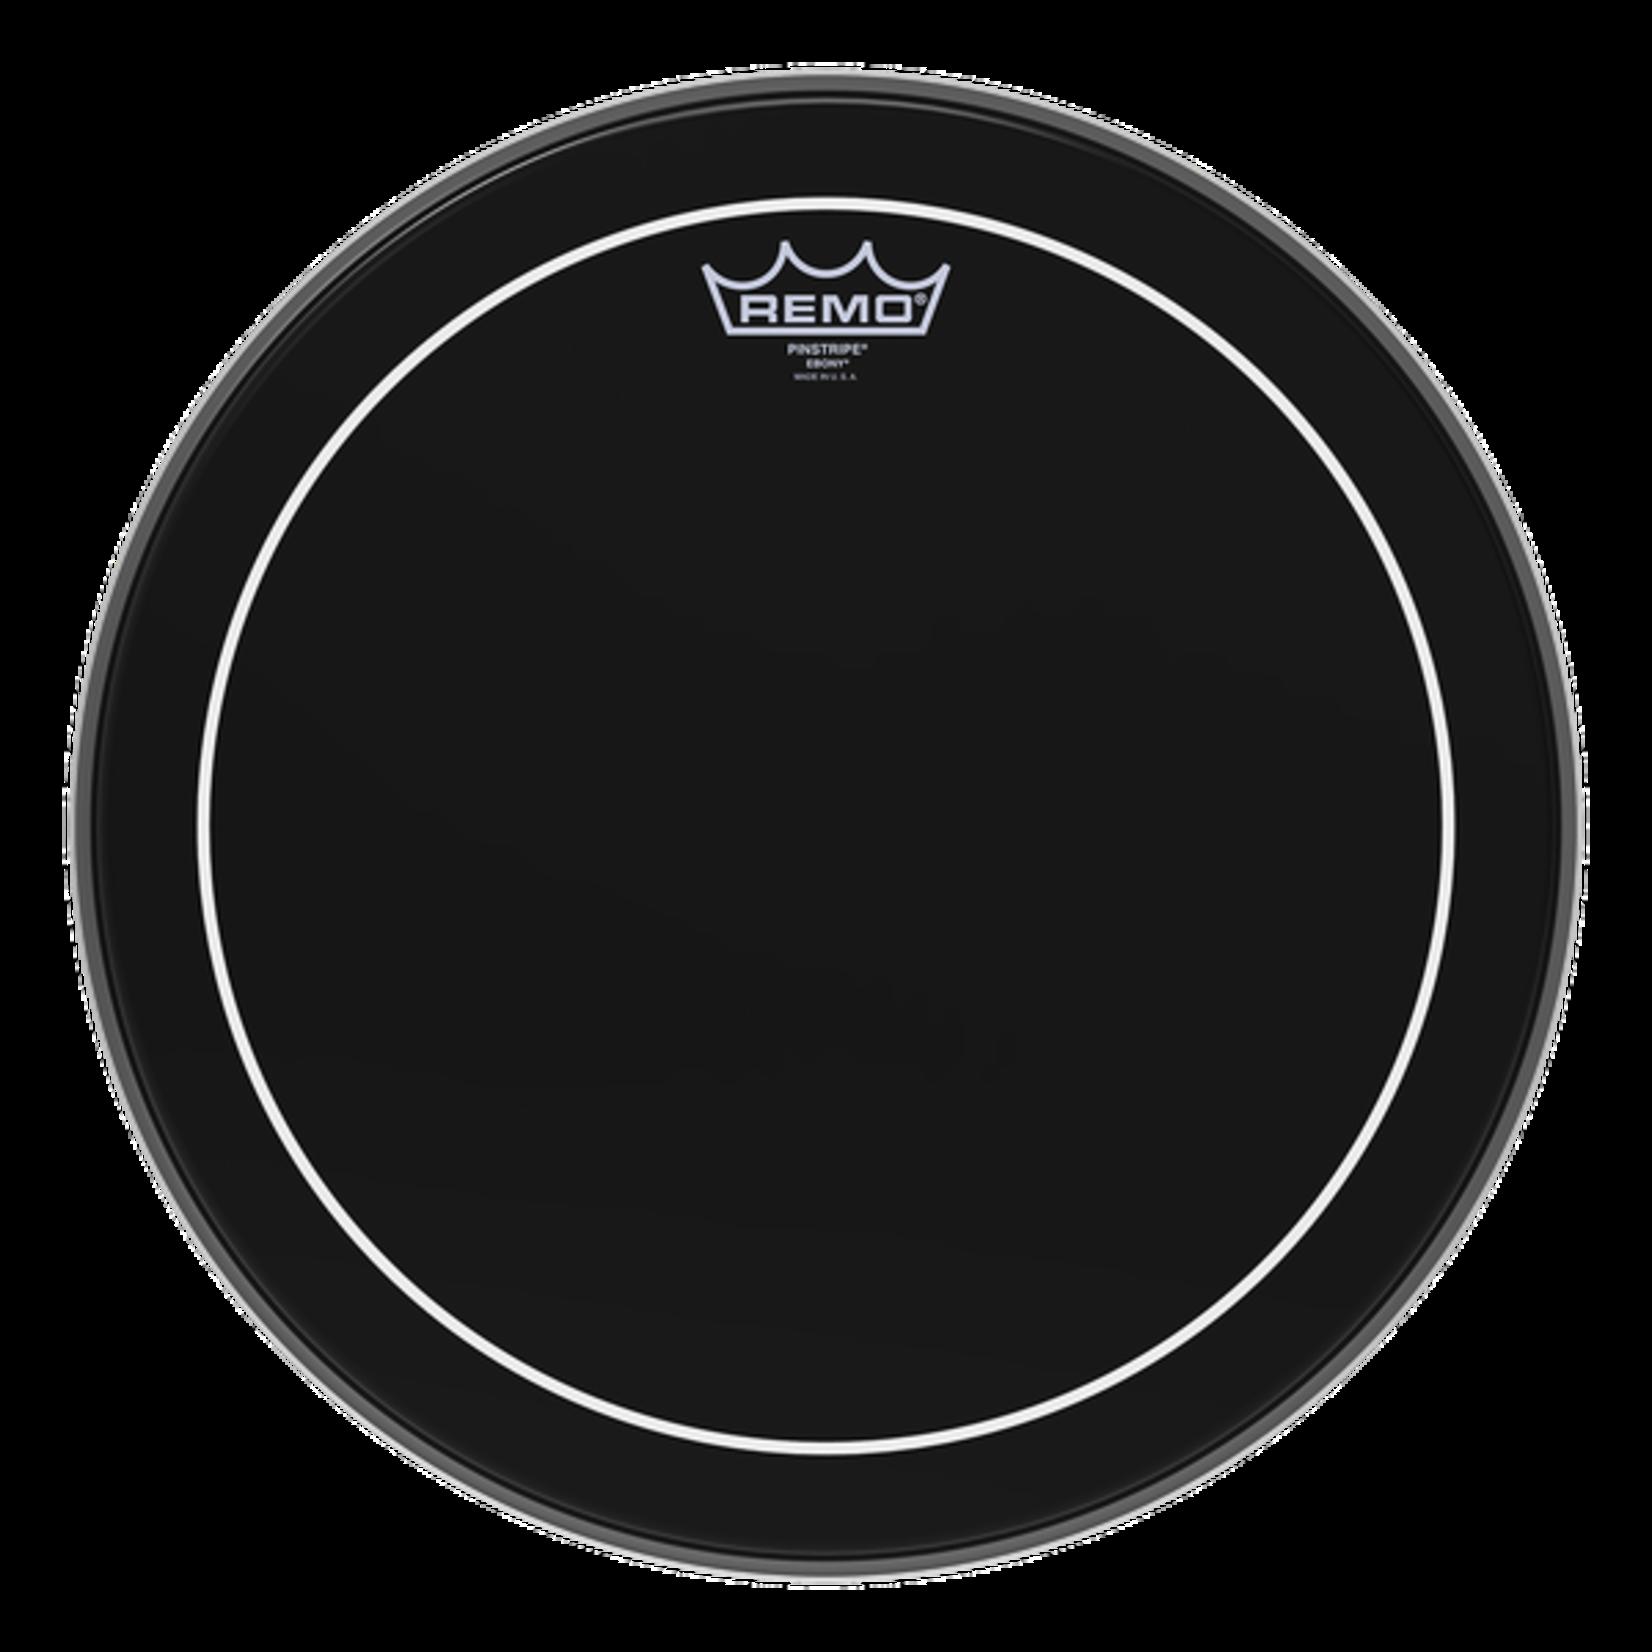 Remo Remo Ebony Pinstripe Bass Drum